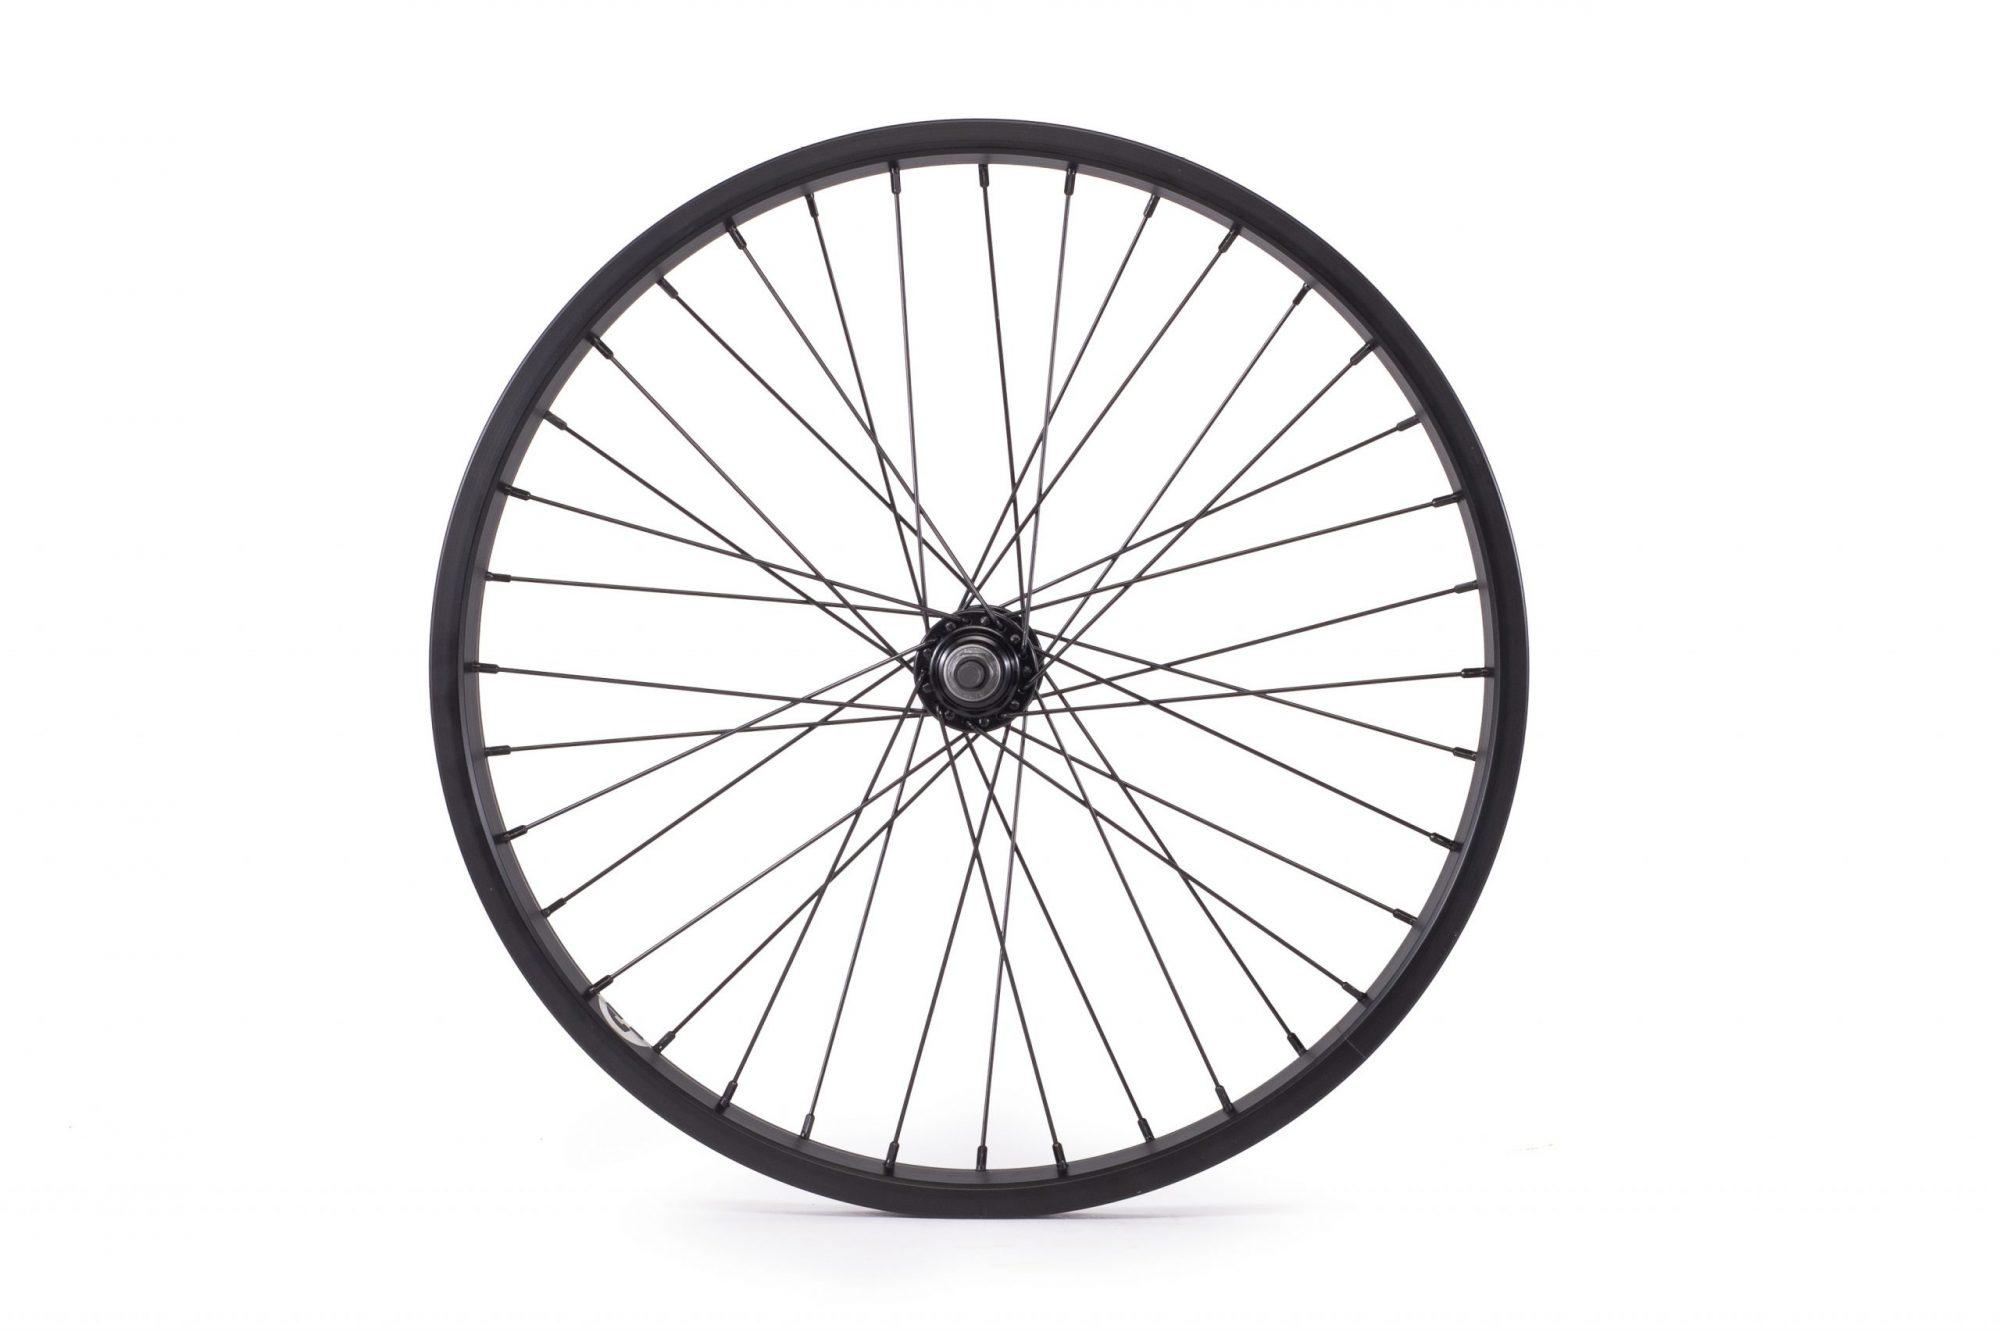 Salt_Everest_flipflop_rear_wheel_black_01